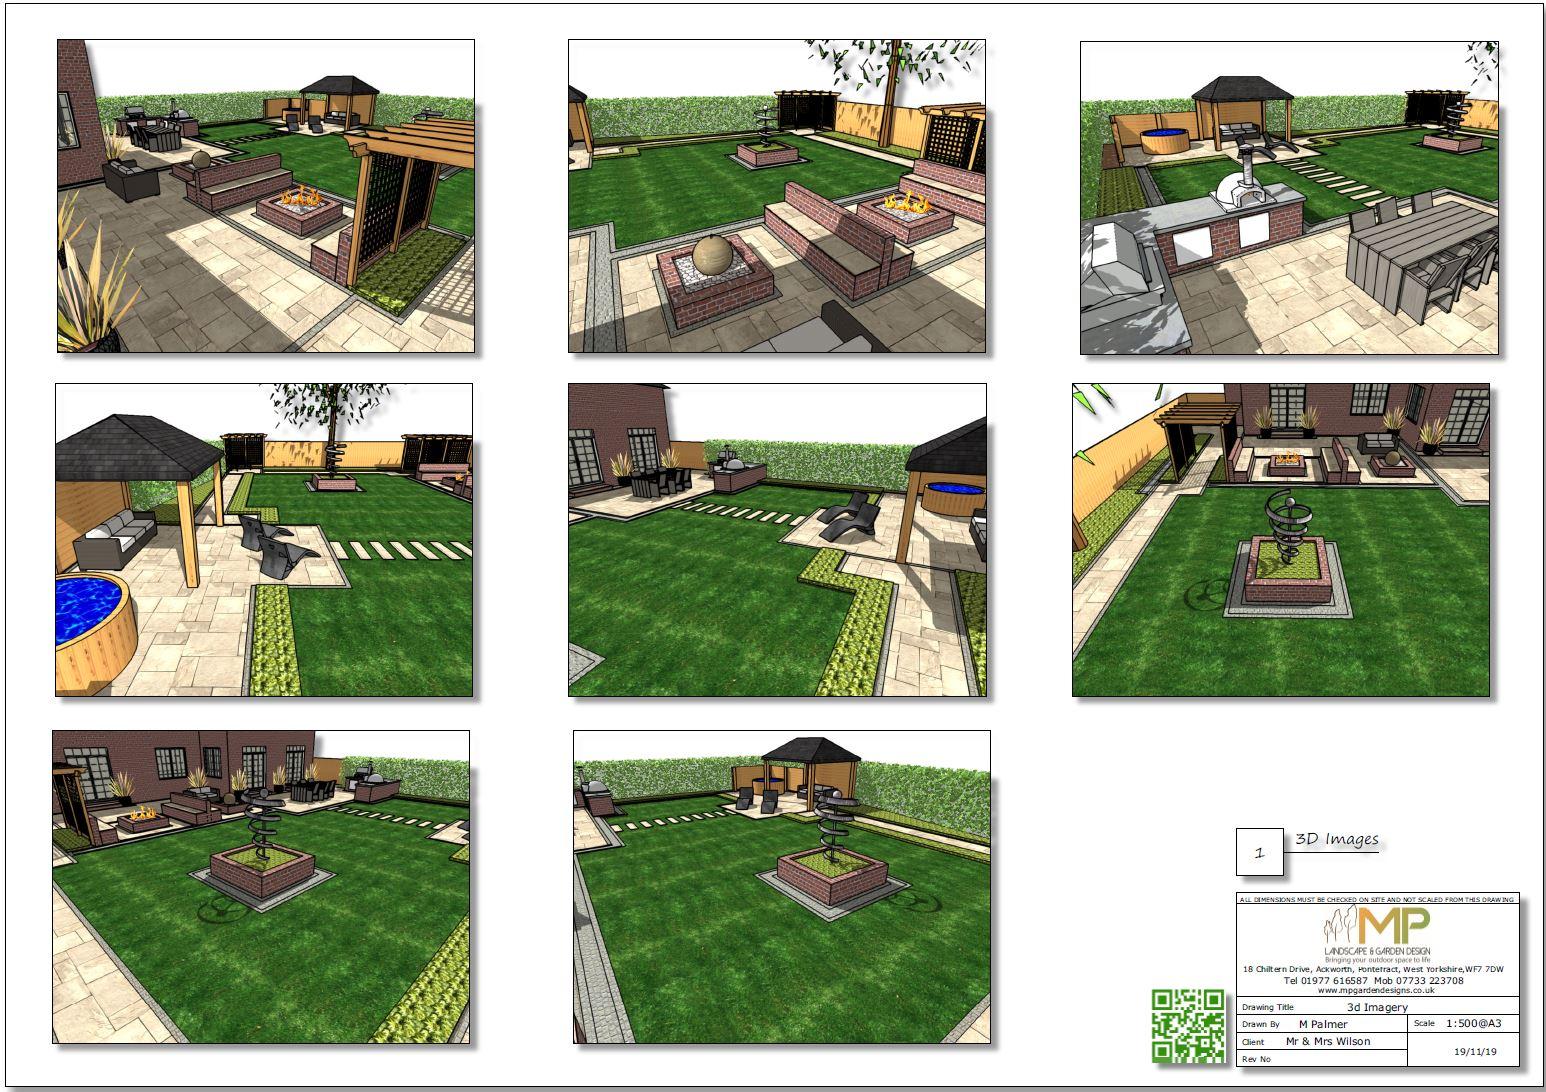 3. 3D Colour concept plan-1, garden designer Wakefield